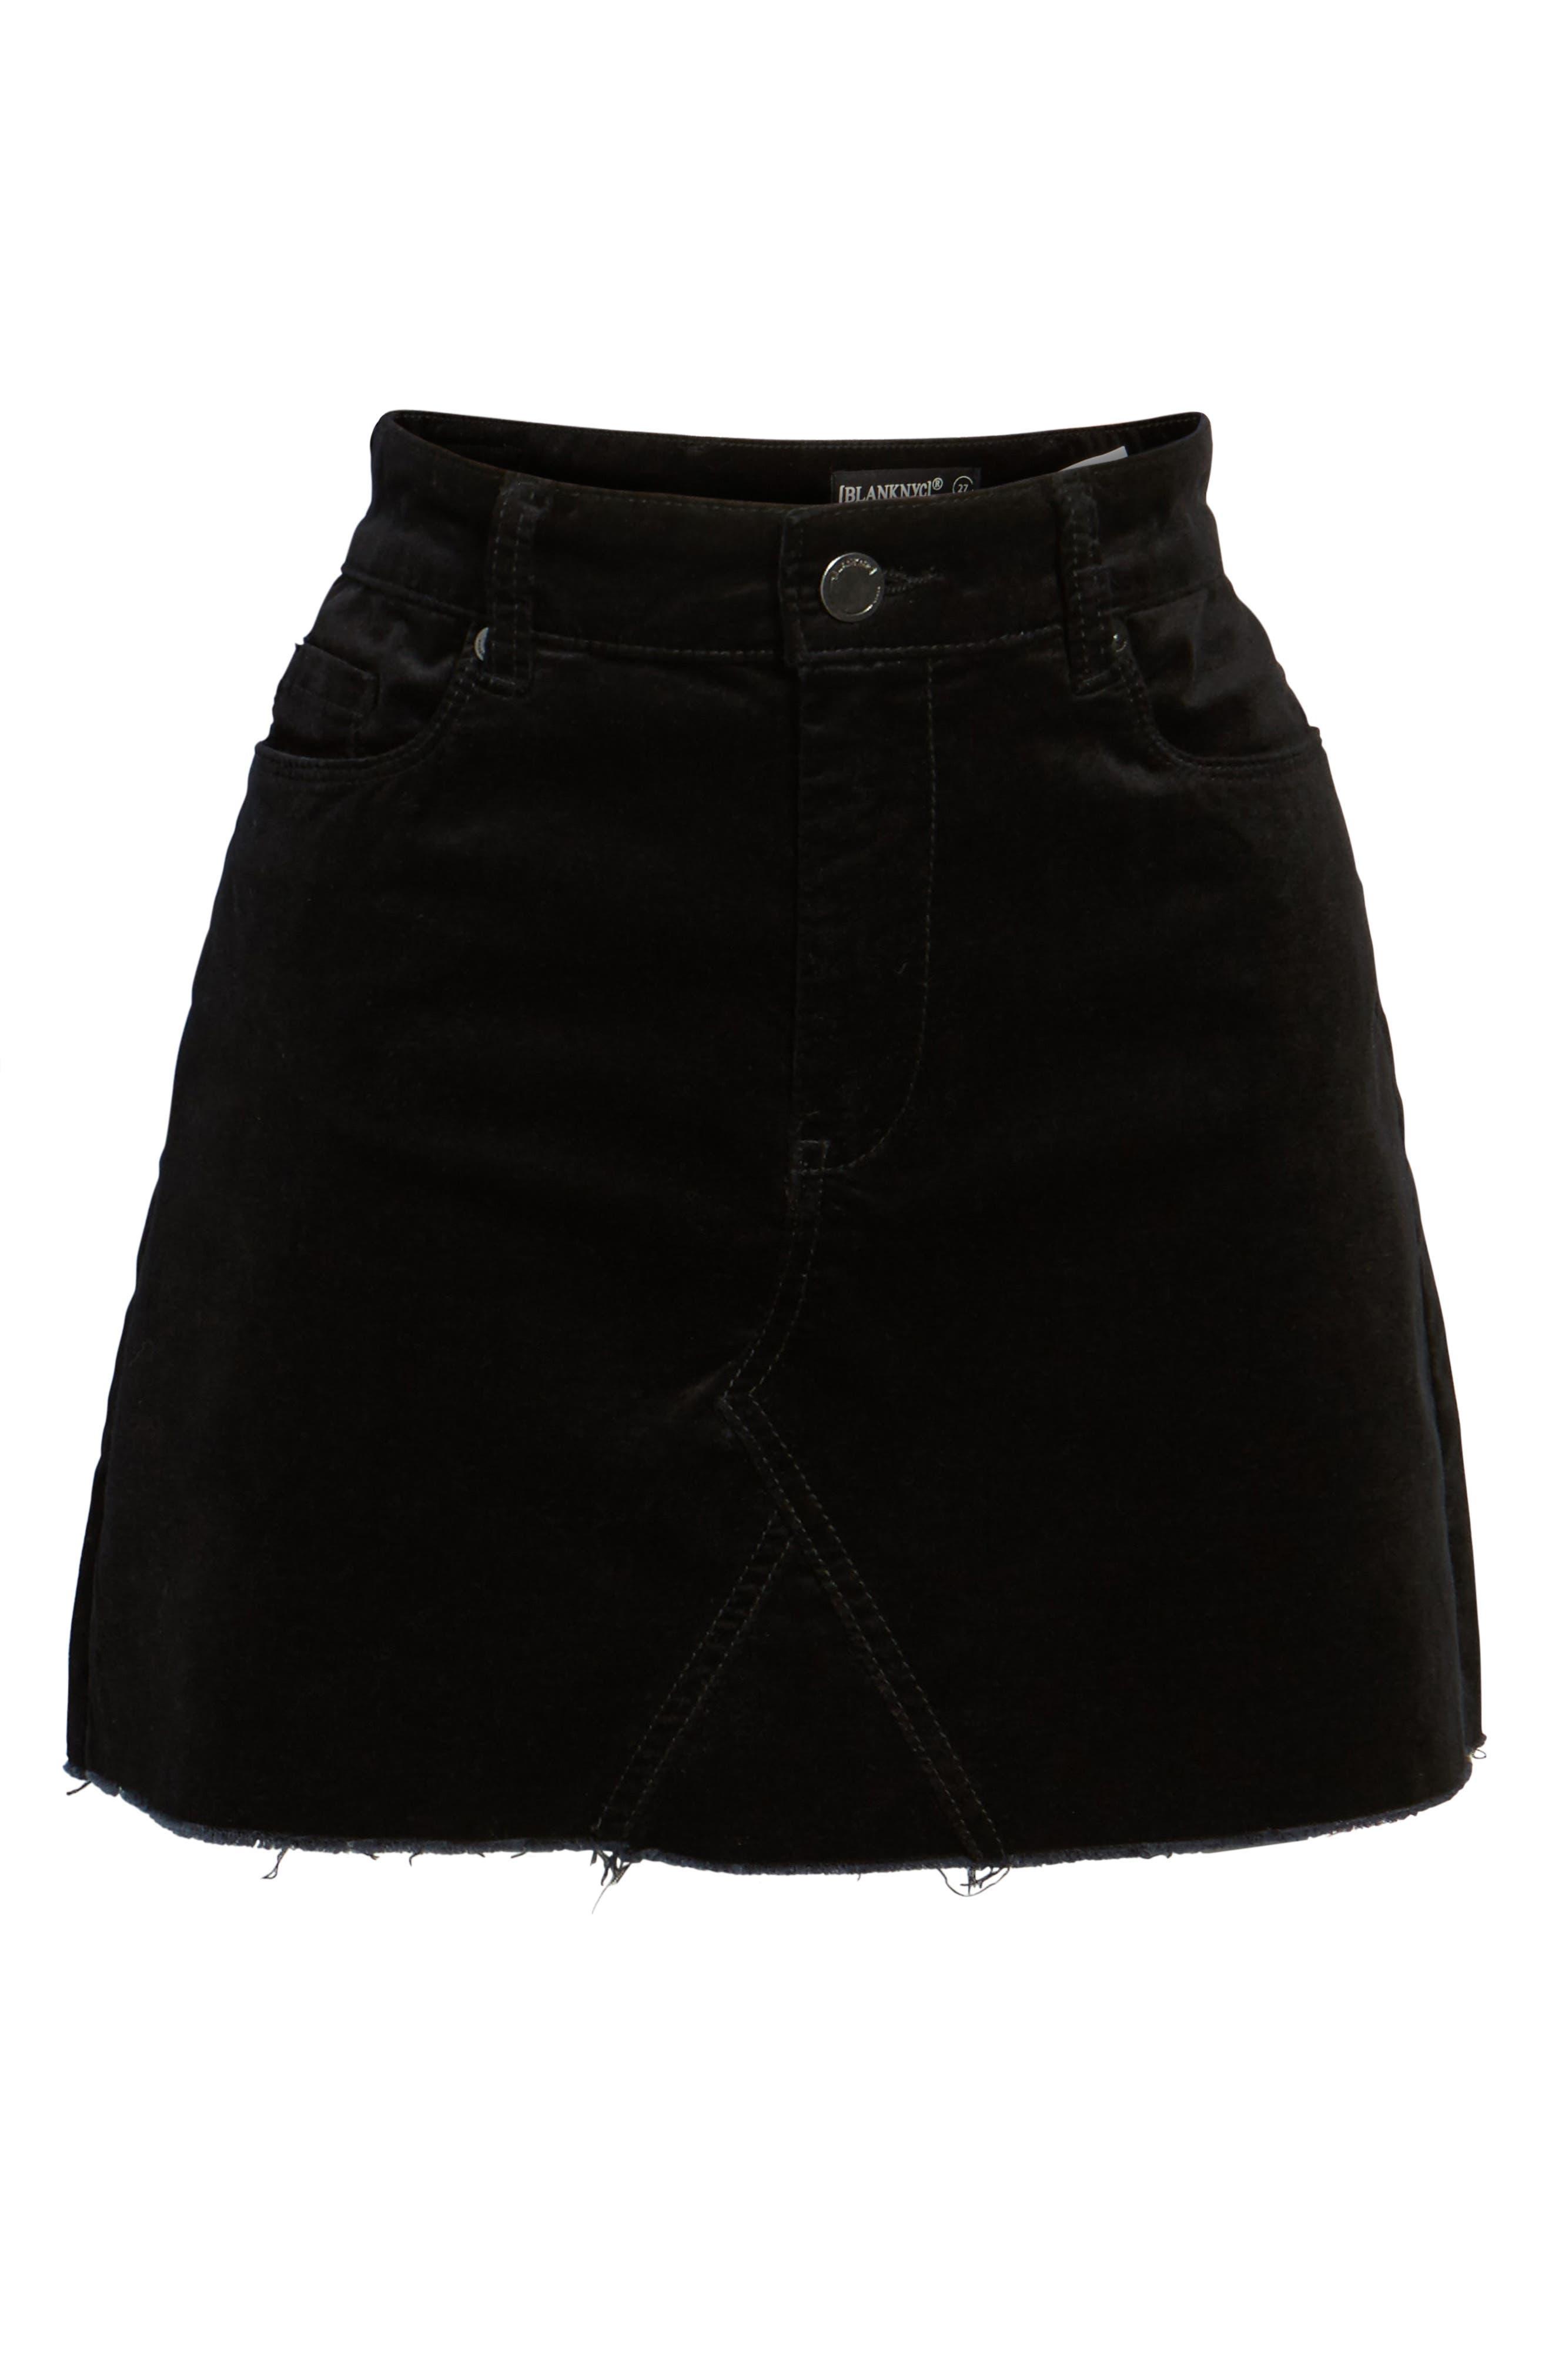 Raw Edge Miniskirt,                             Alternate thumbnail 6, color,                             001